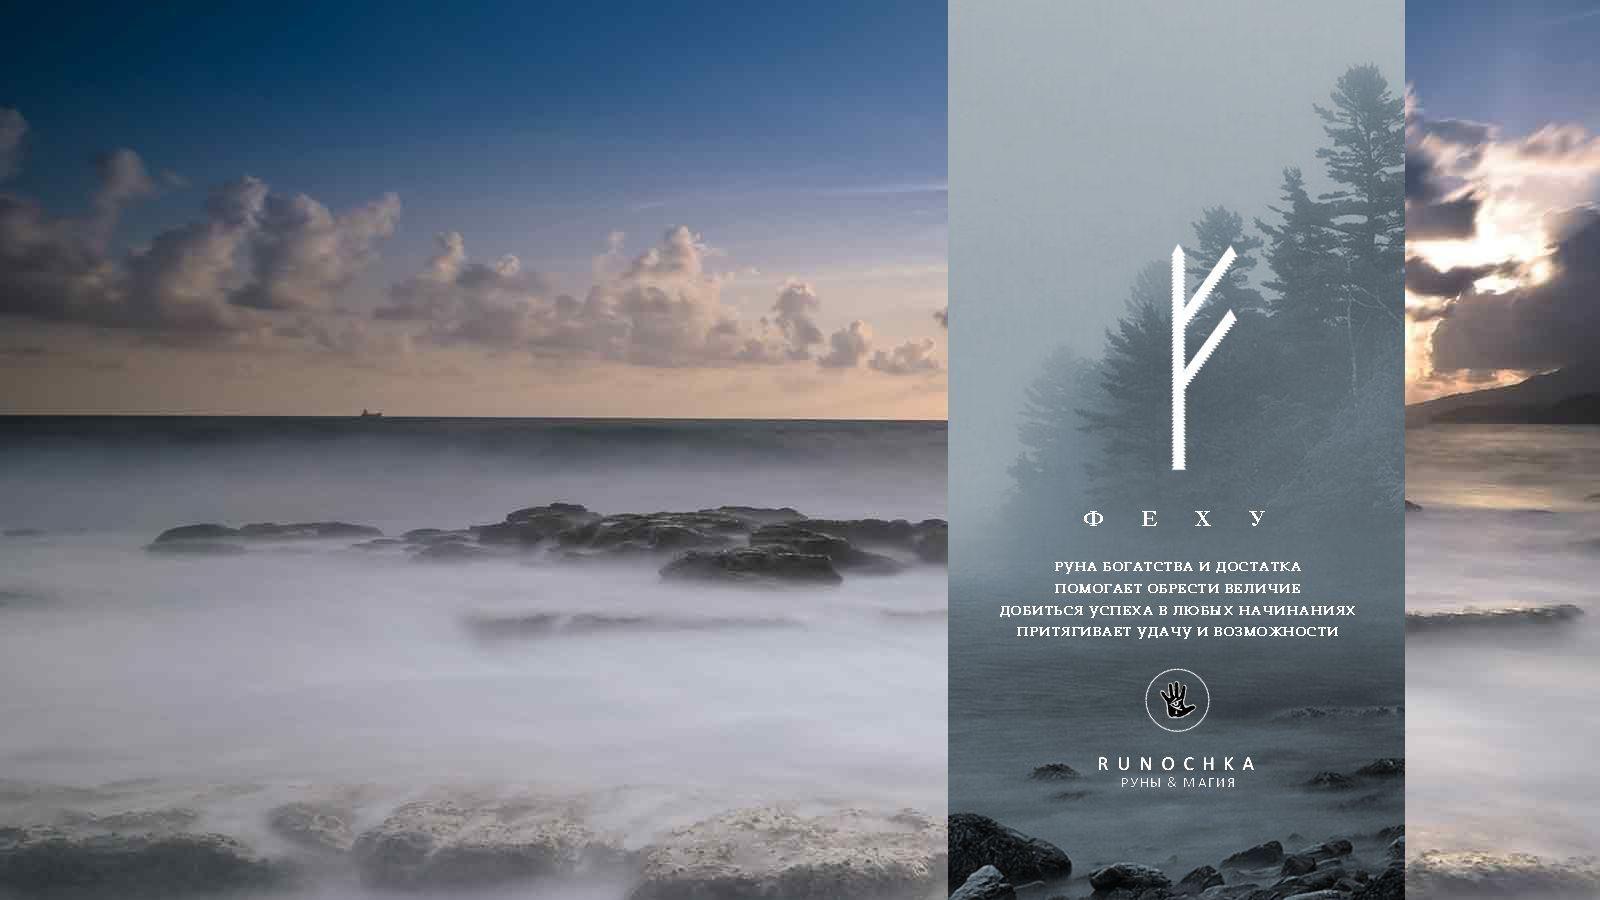 Руна Феху: значение, описание и ее толкование с фото